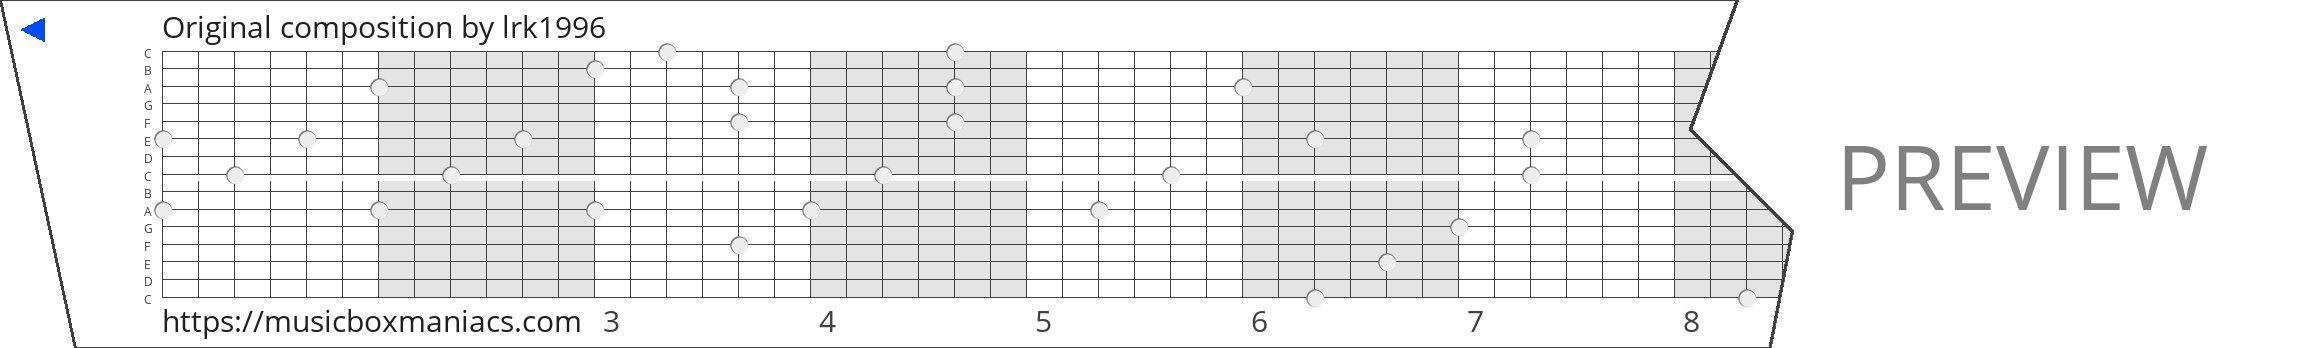 Original composition 15 note music box paper strip